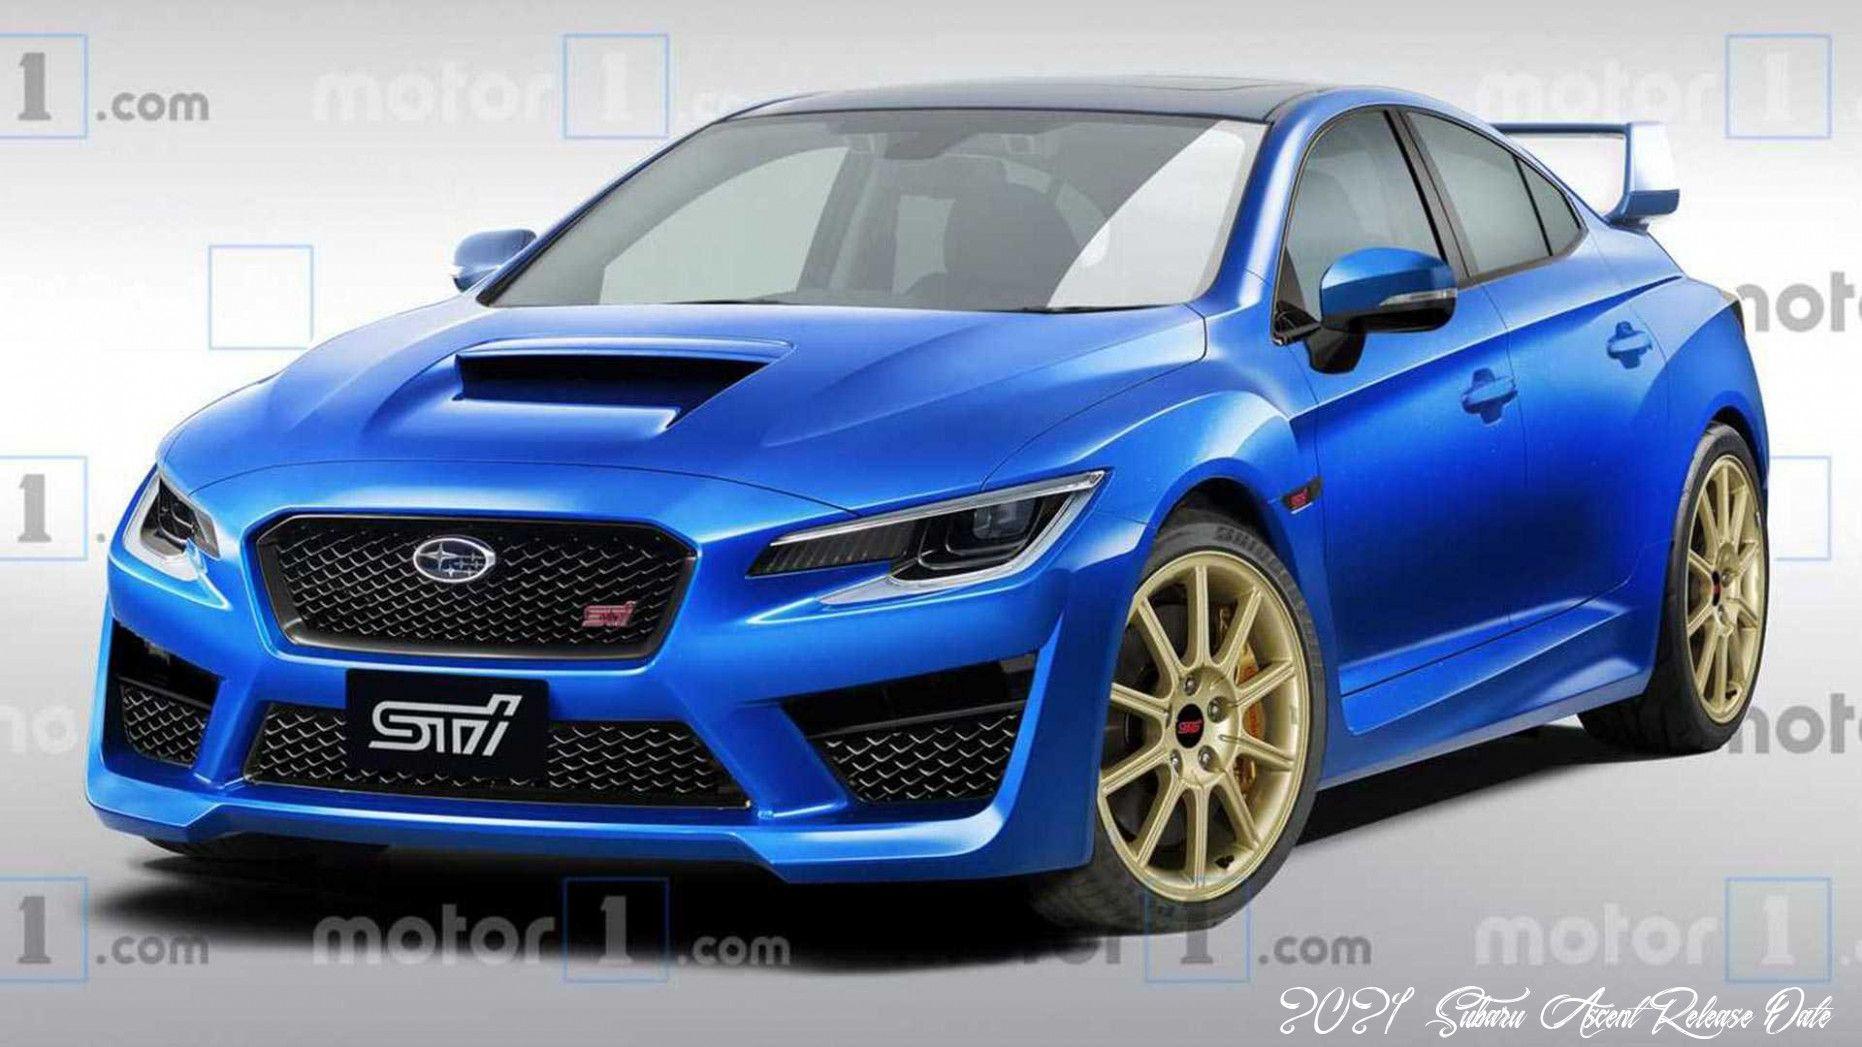 2021 Subaru Ascent Release Date Style In 2020 Subaru Rally Sti Hatchback Subaru Wrx Sti Hatchback